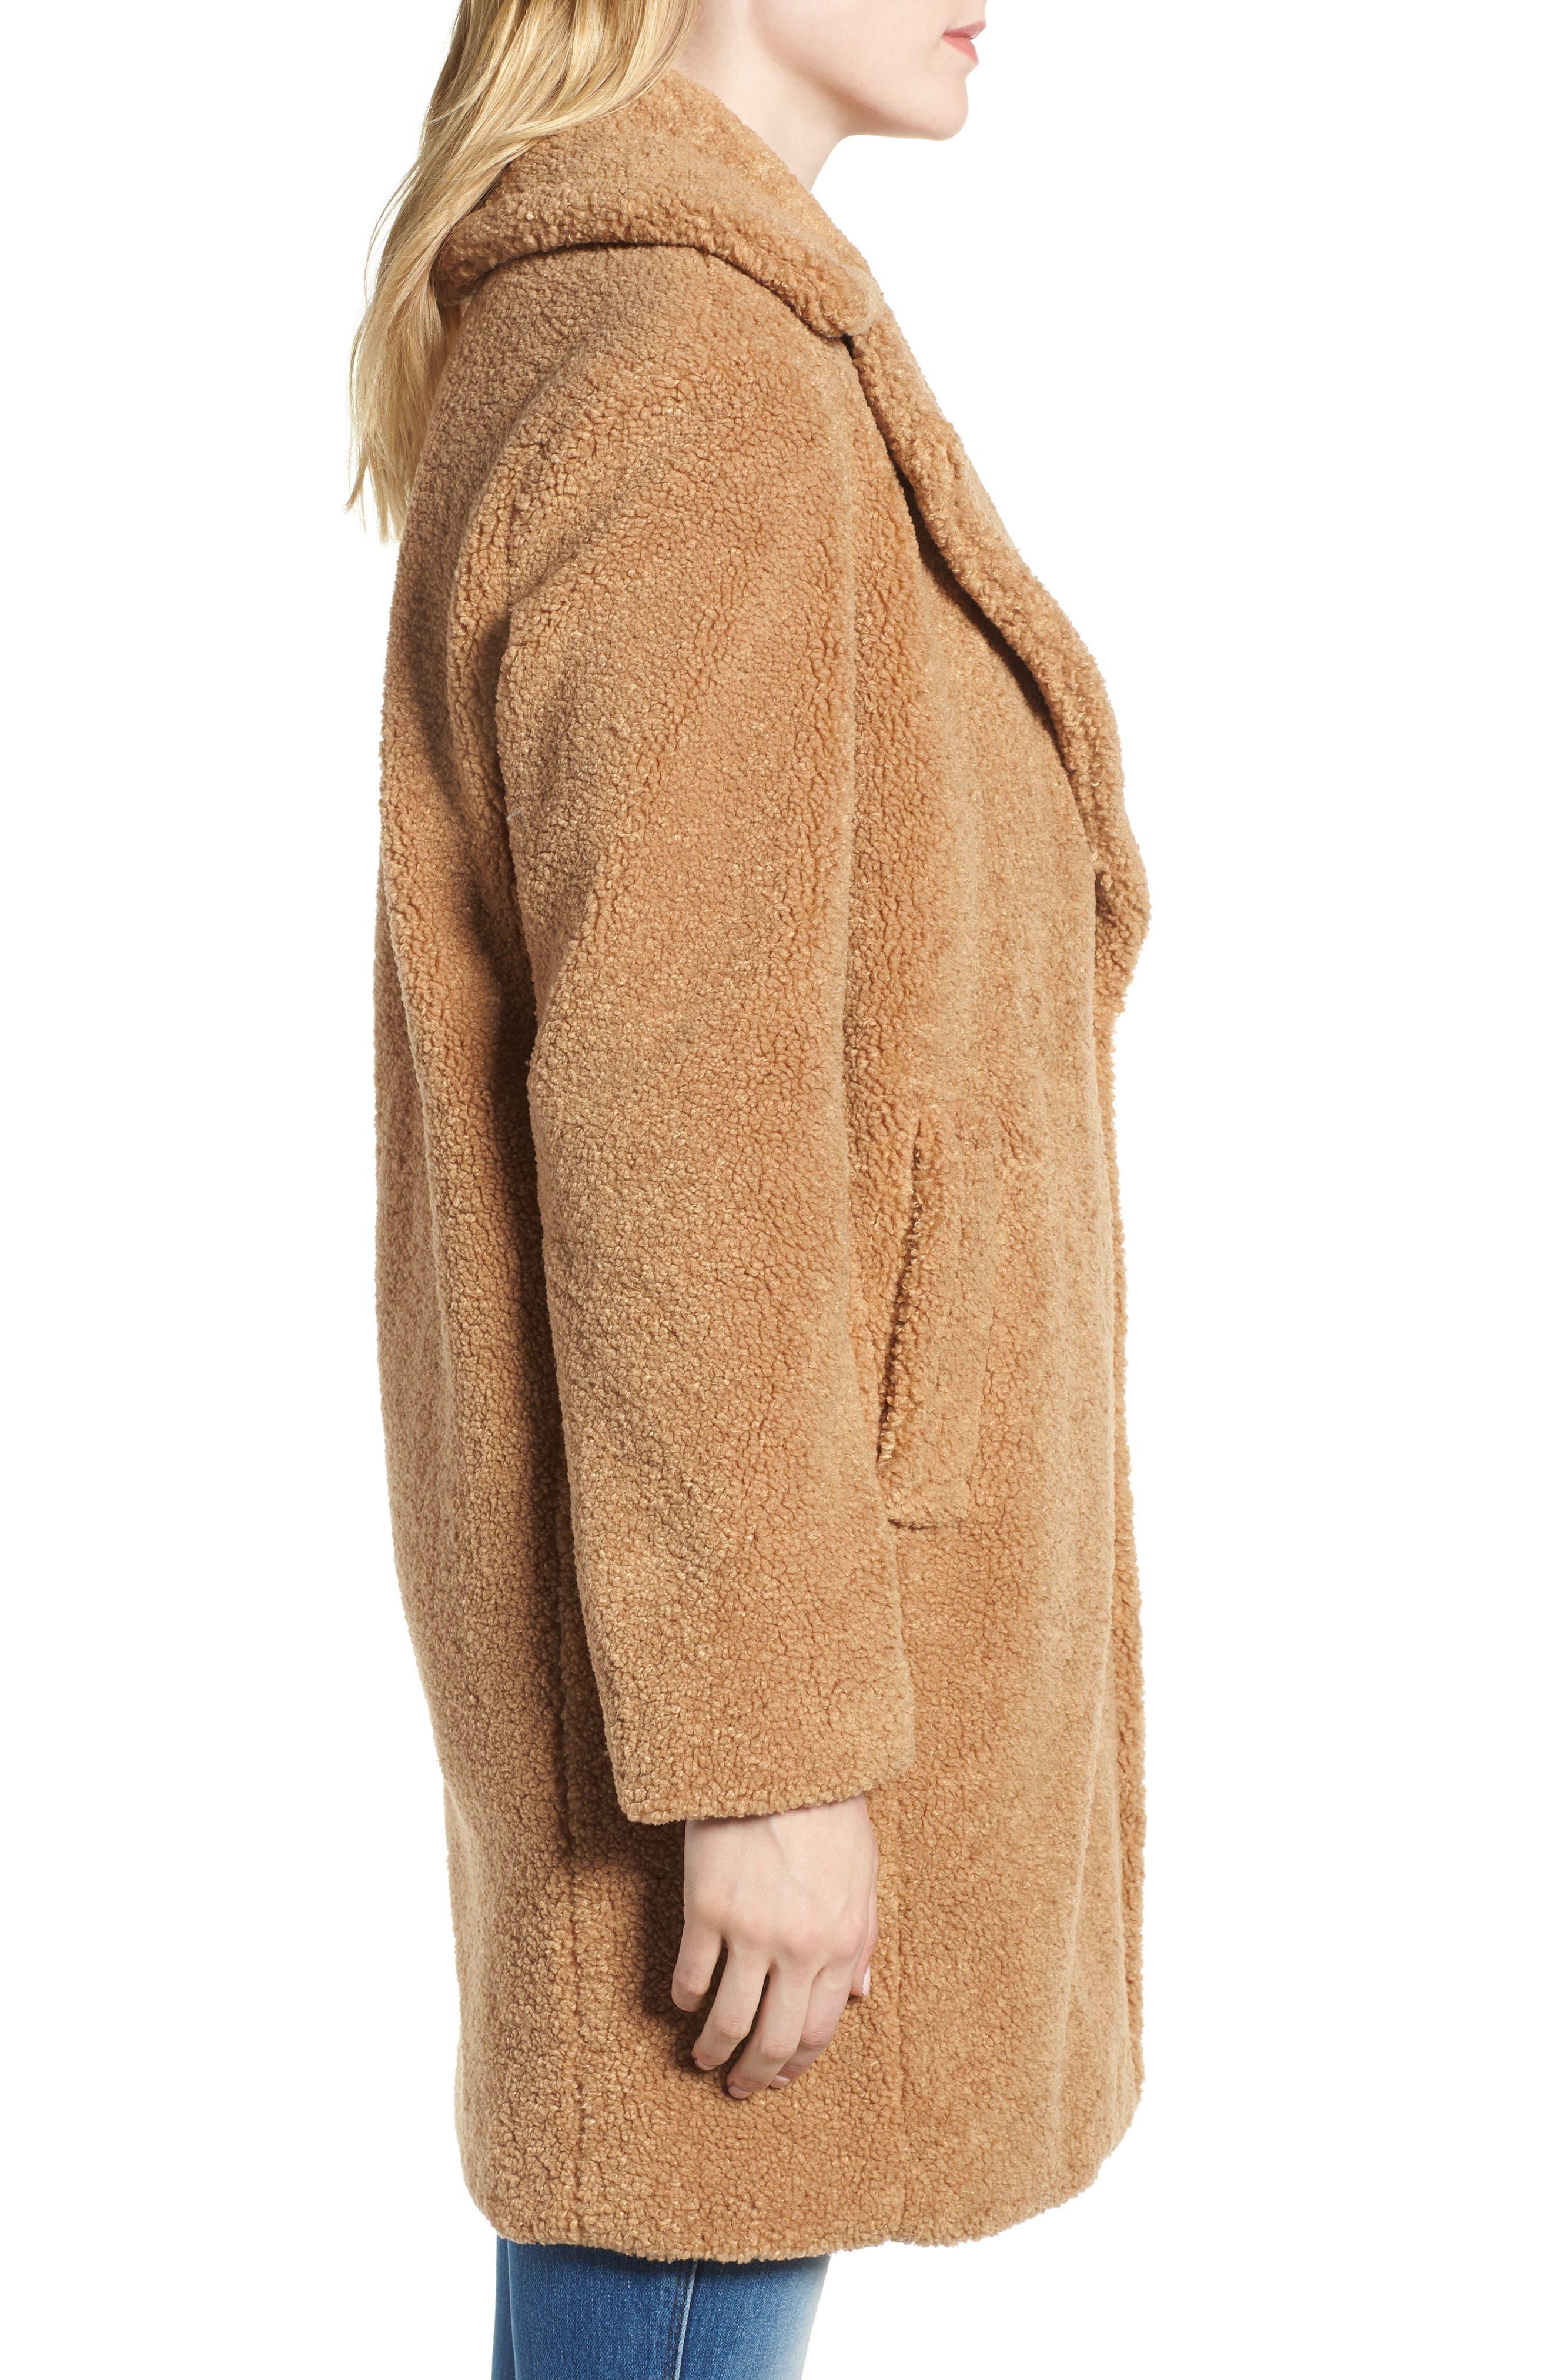 Faux Fur Teddy Bear Coat,                             Alternate thumbnail 3, color,                             256